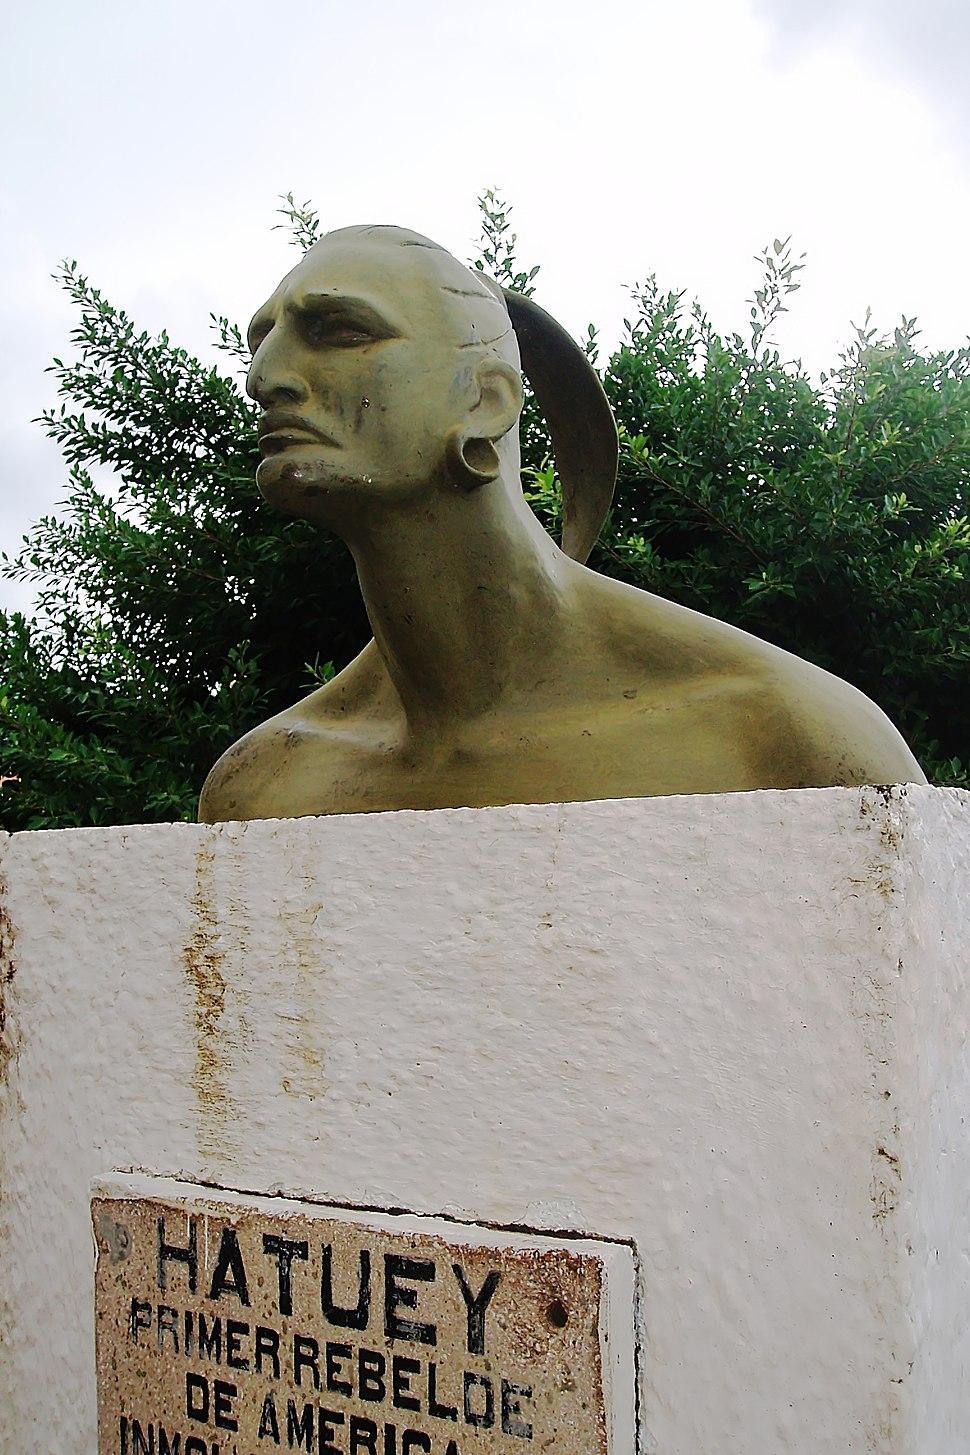 Hatuey monument, Baracoa, Cuba